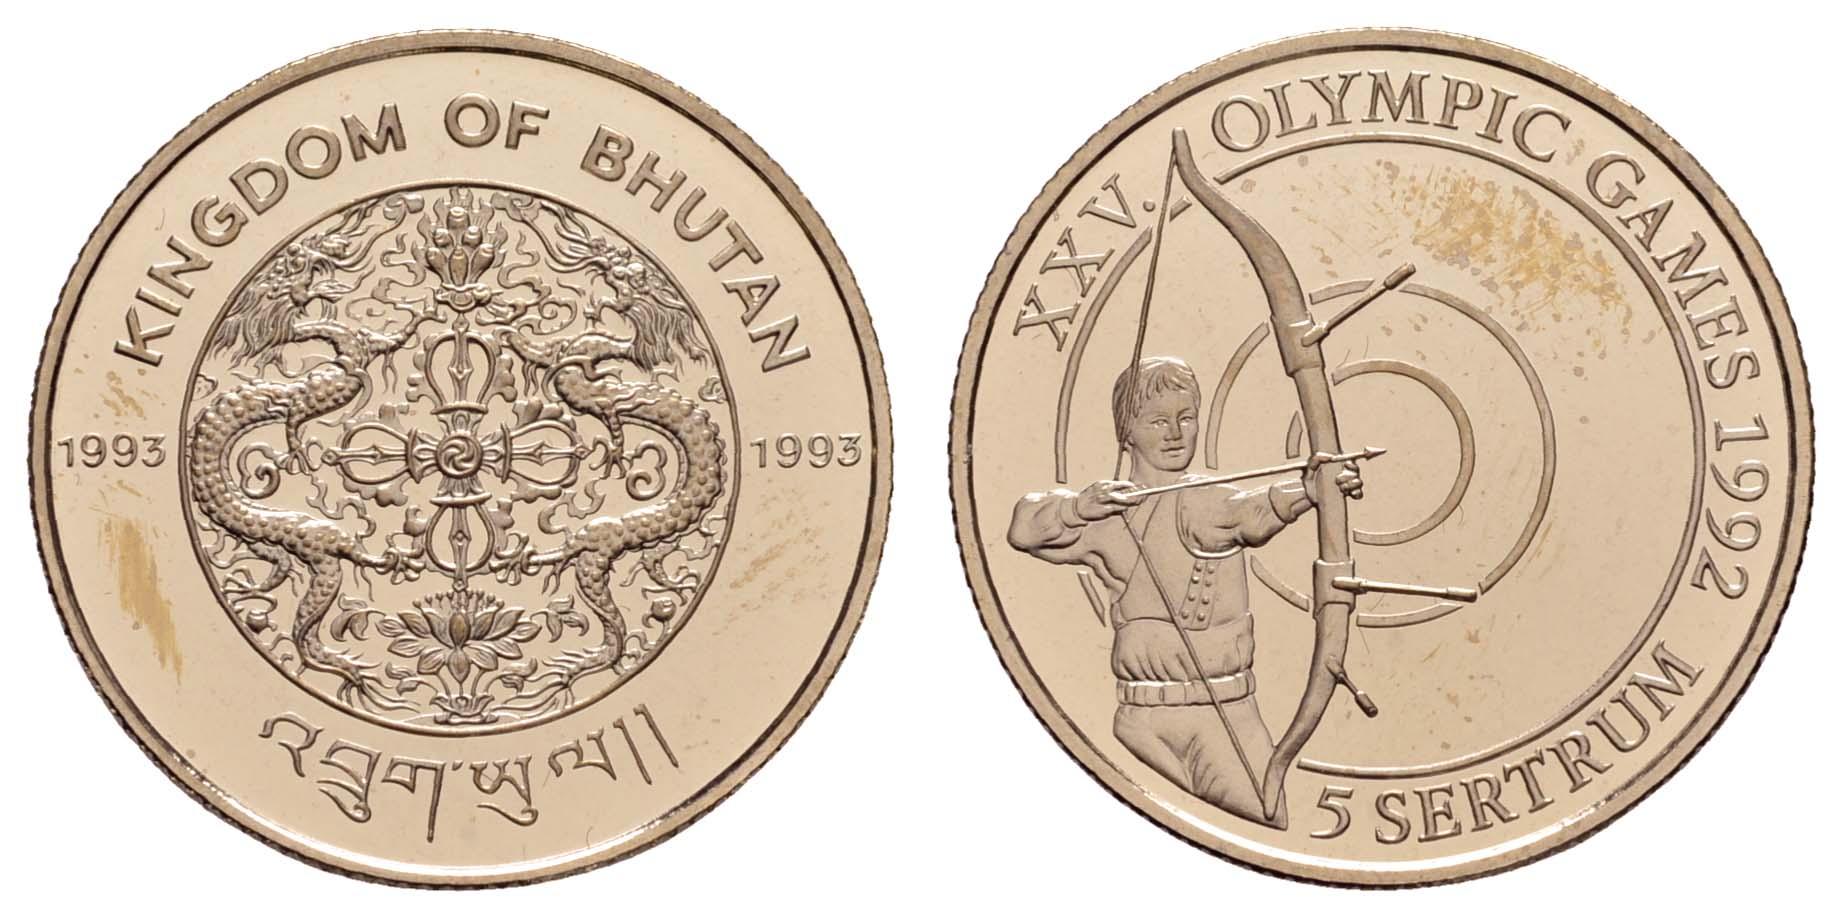 Lot 1873 - übersee bhutan -  Auktionshaus Ulrich Felzmann GmbH & Co. KG Coins single lots